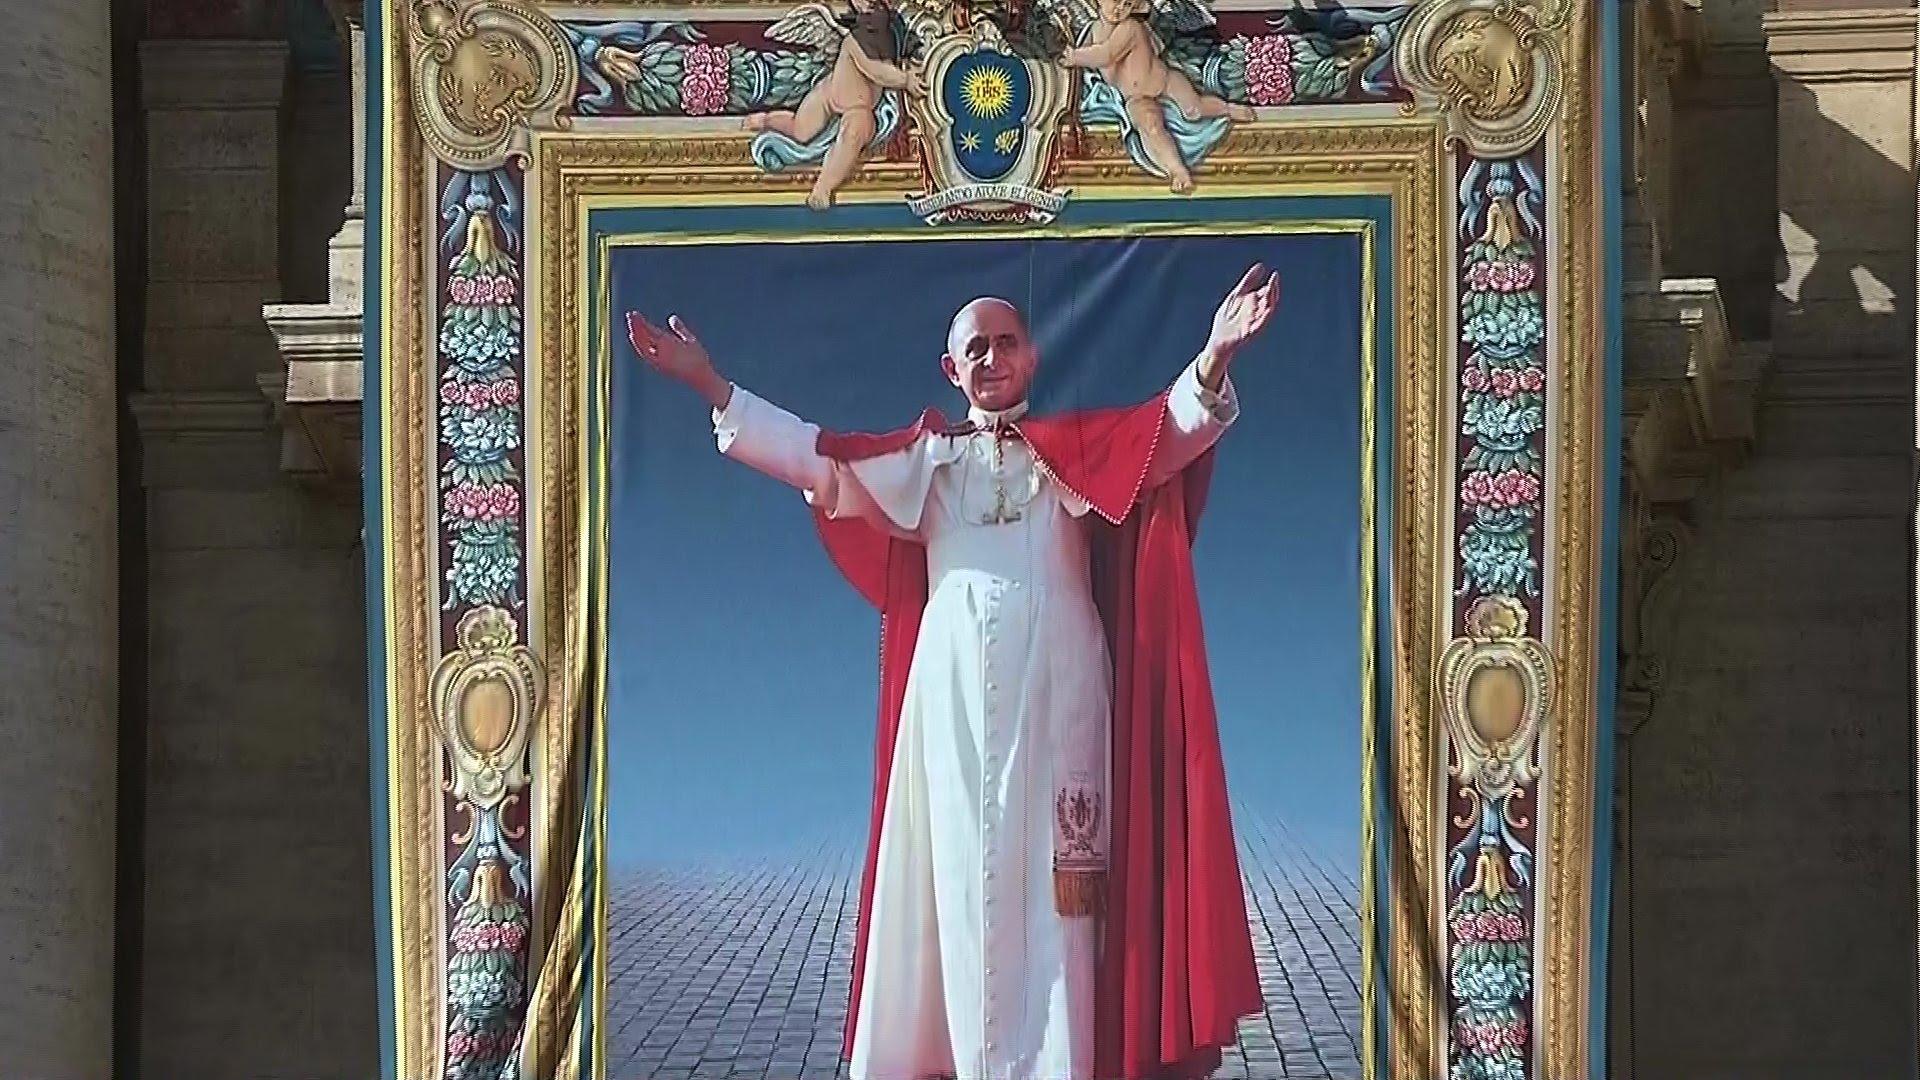 Kanonizacija pape pavla vi